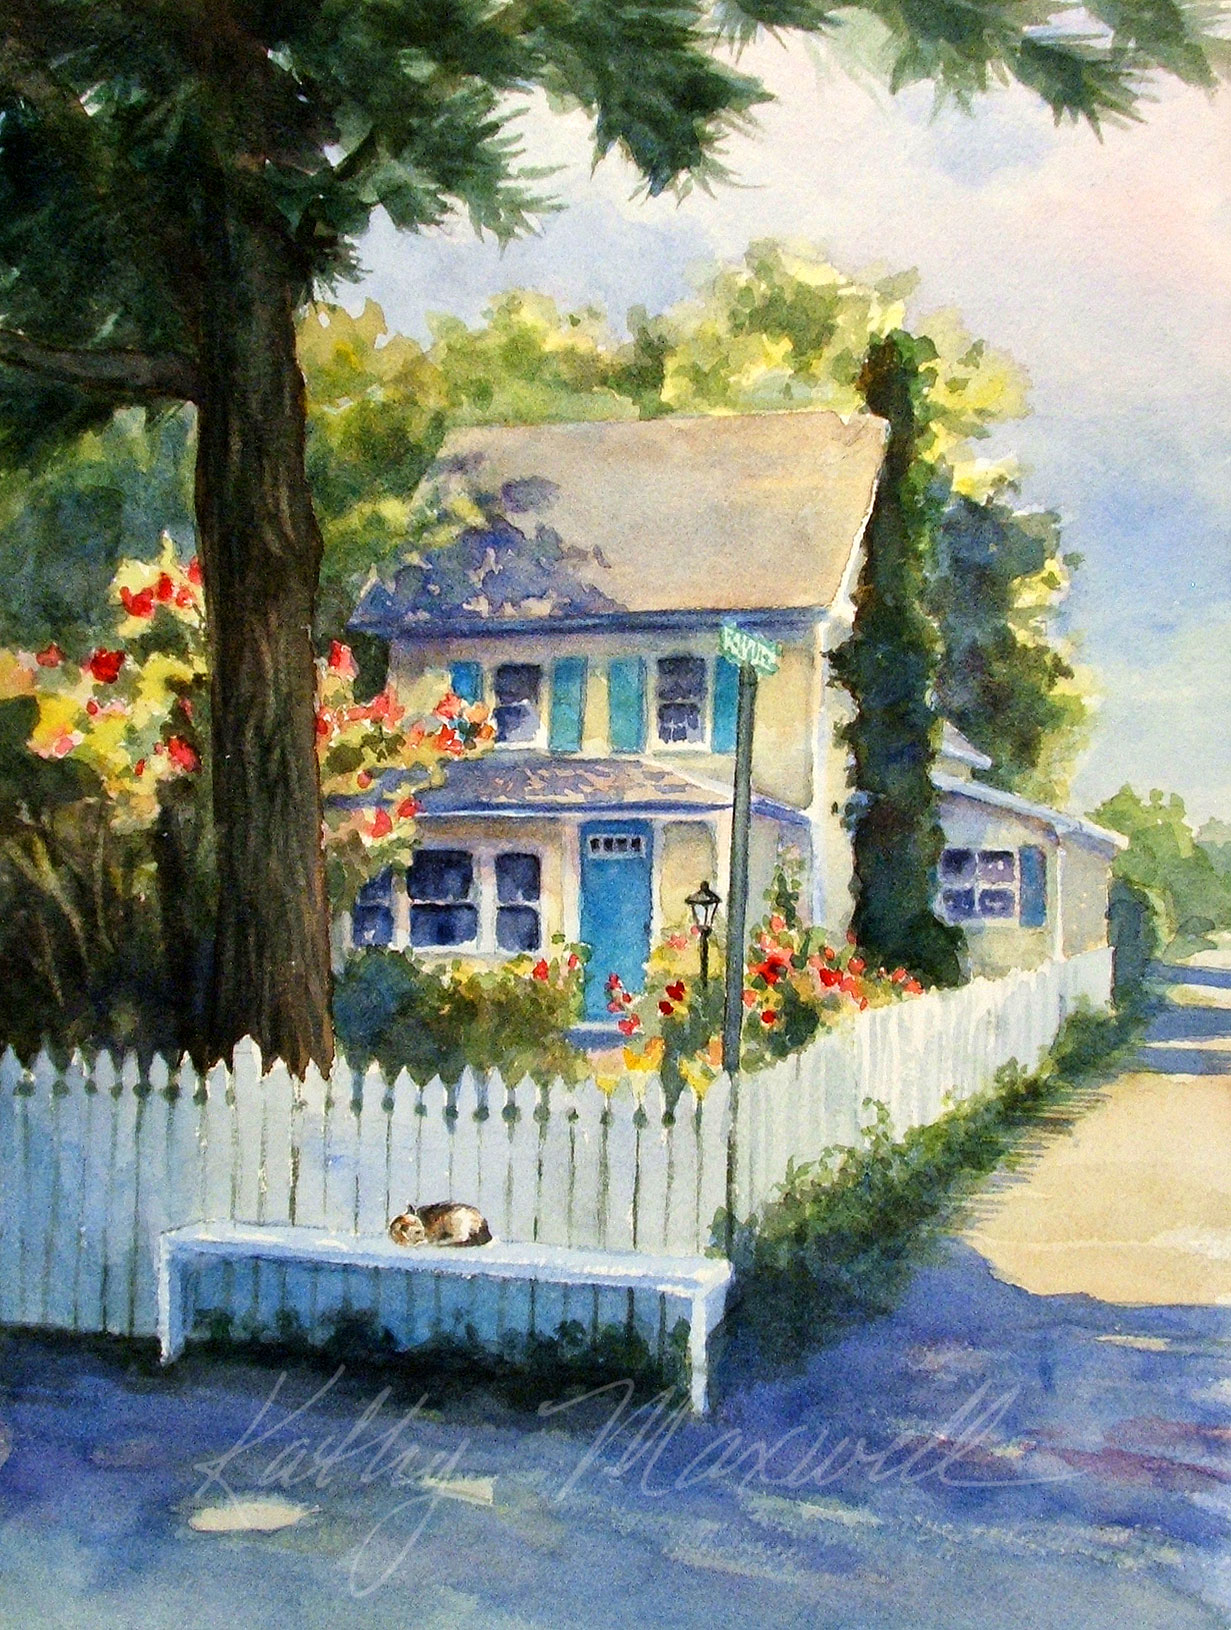 Tangier Island Cottage (Tangier Island, VA)